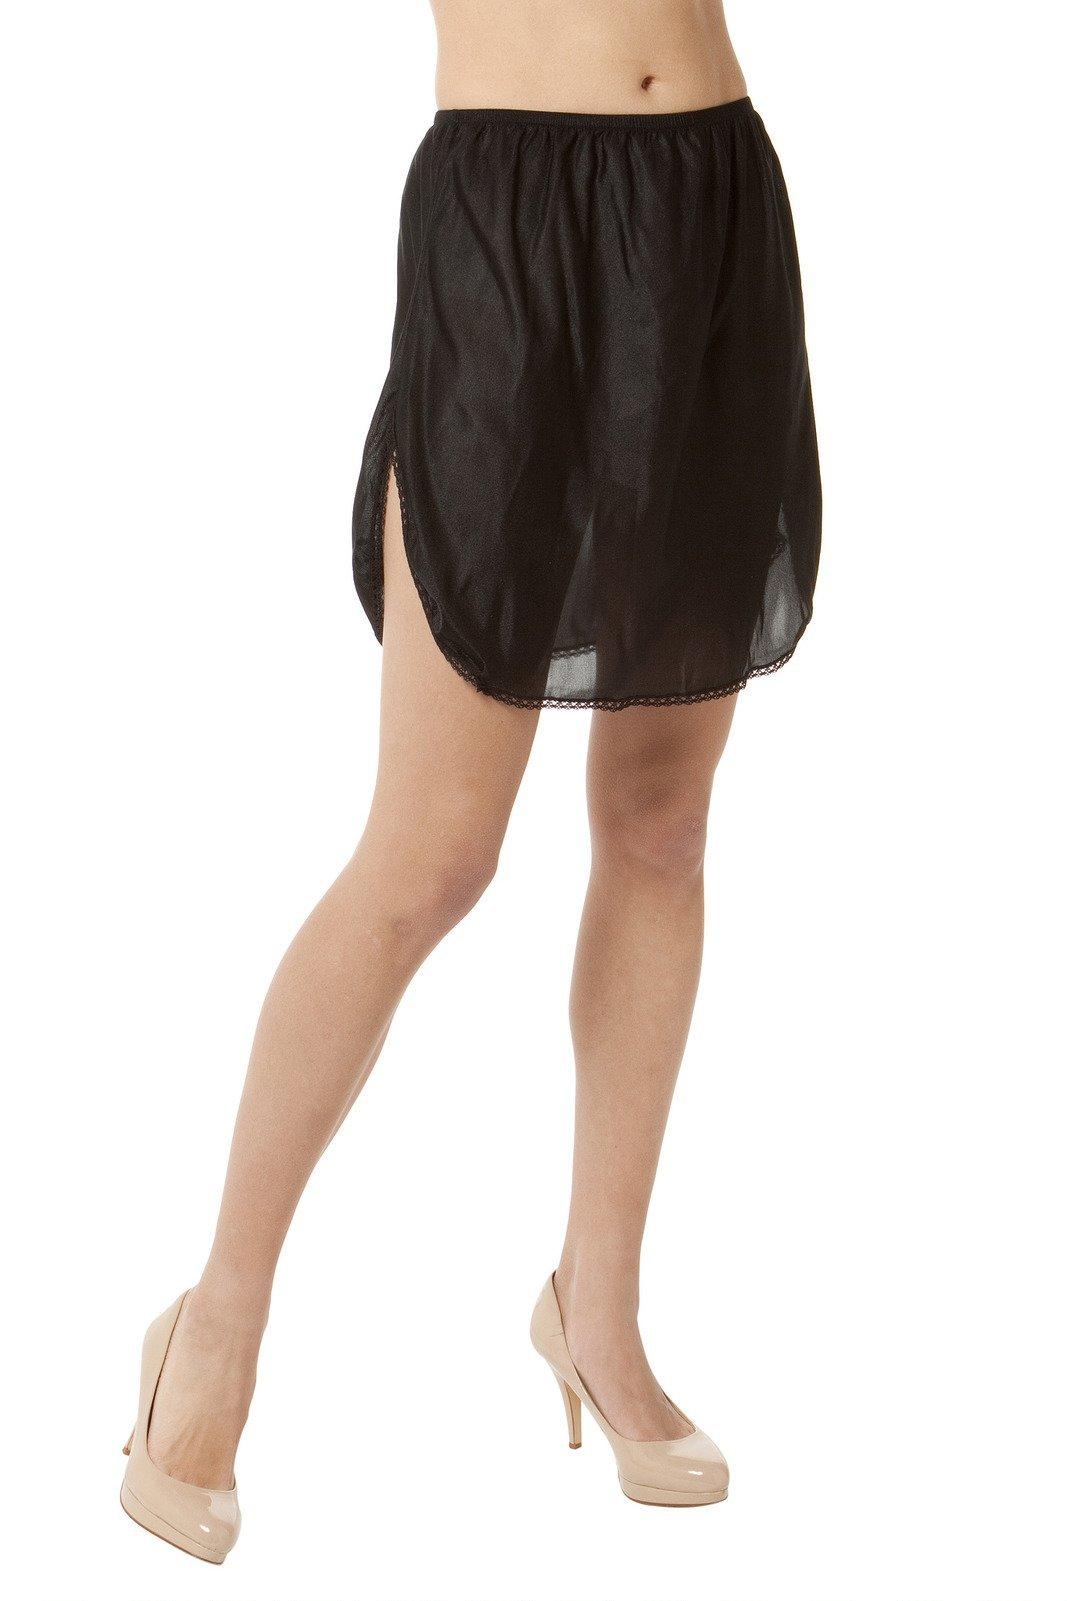 "Malco Modes 20"" Luxury Double Slit Half Slip Underskirt - Nylon w/Lace"